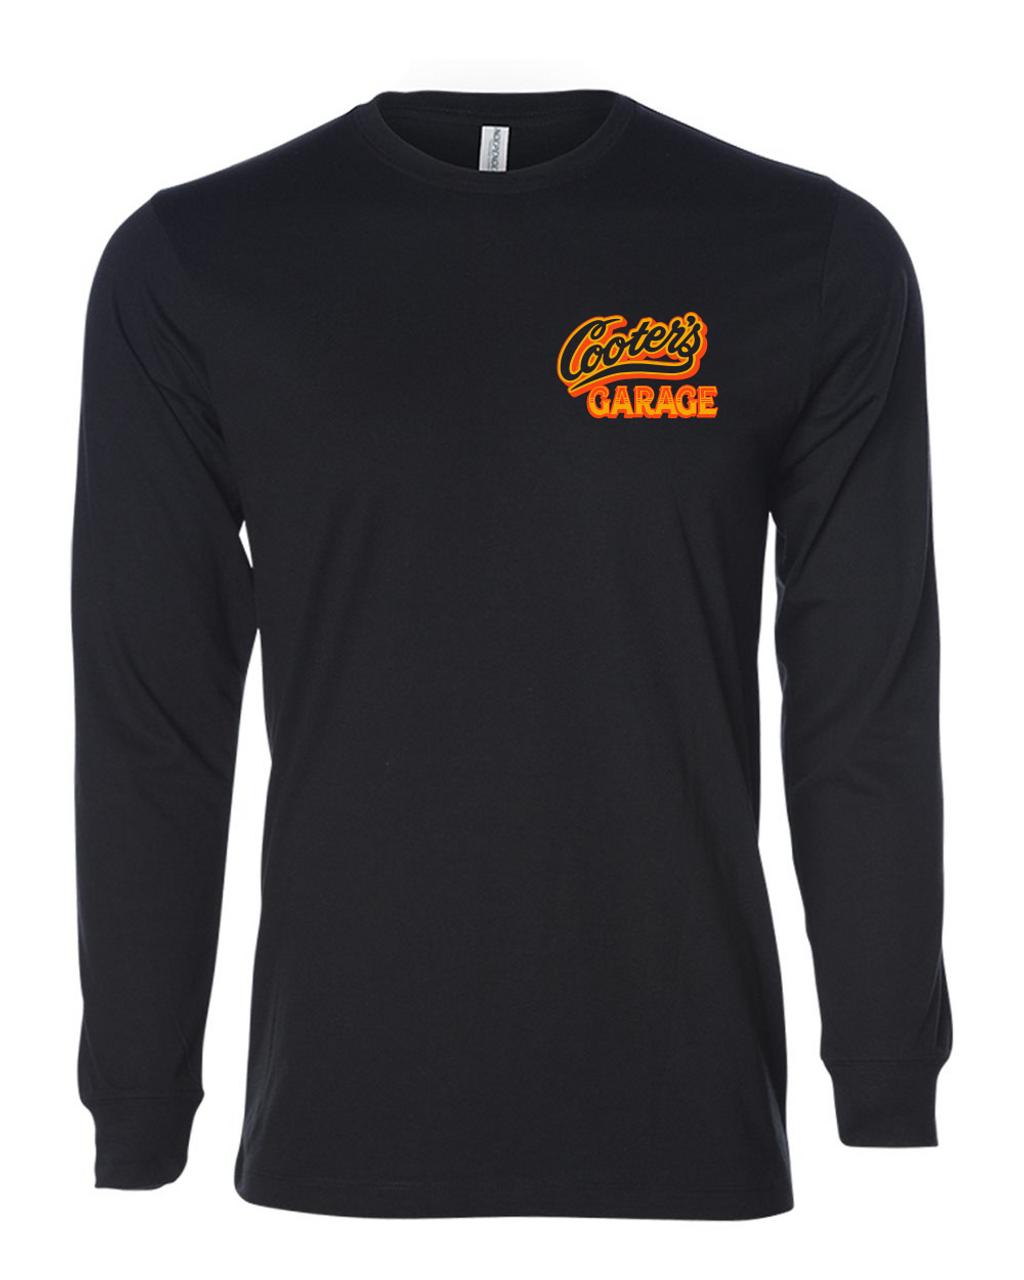 Cars of Hazzard Long Sleeve T-Shirt Black Front